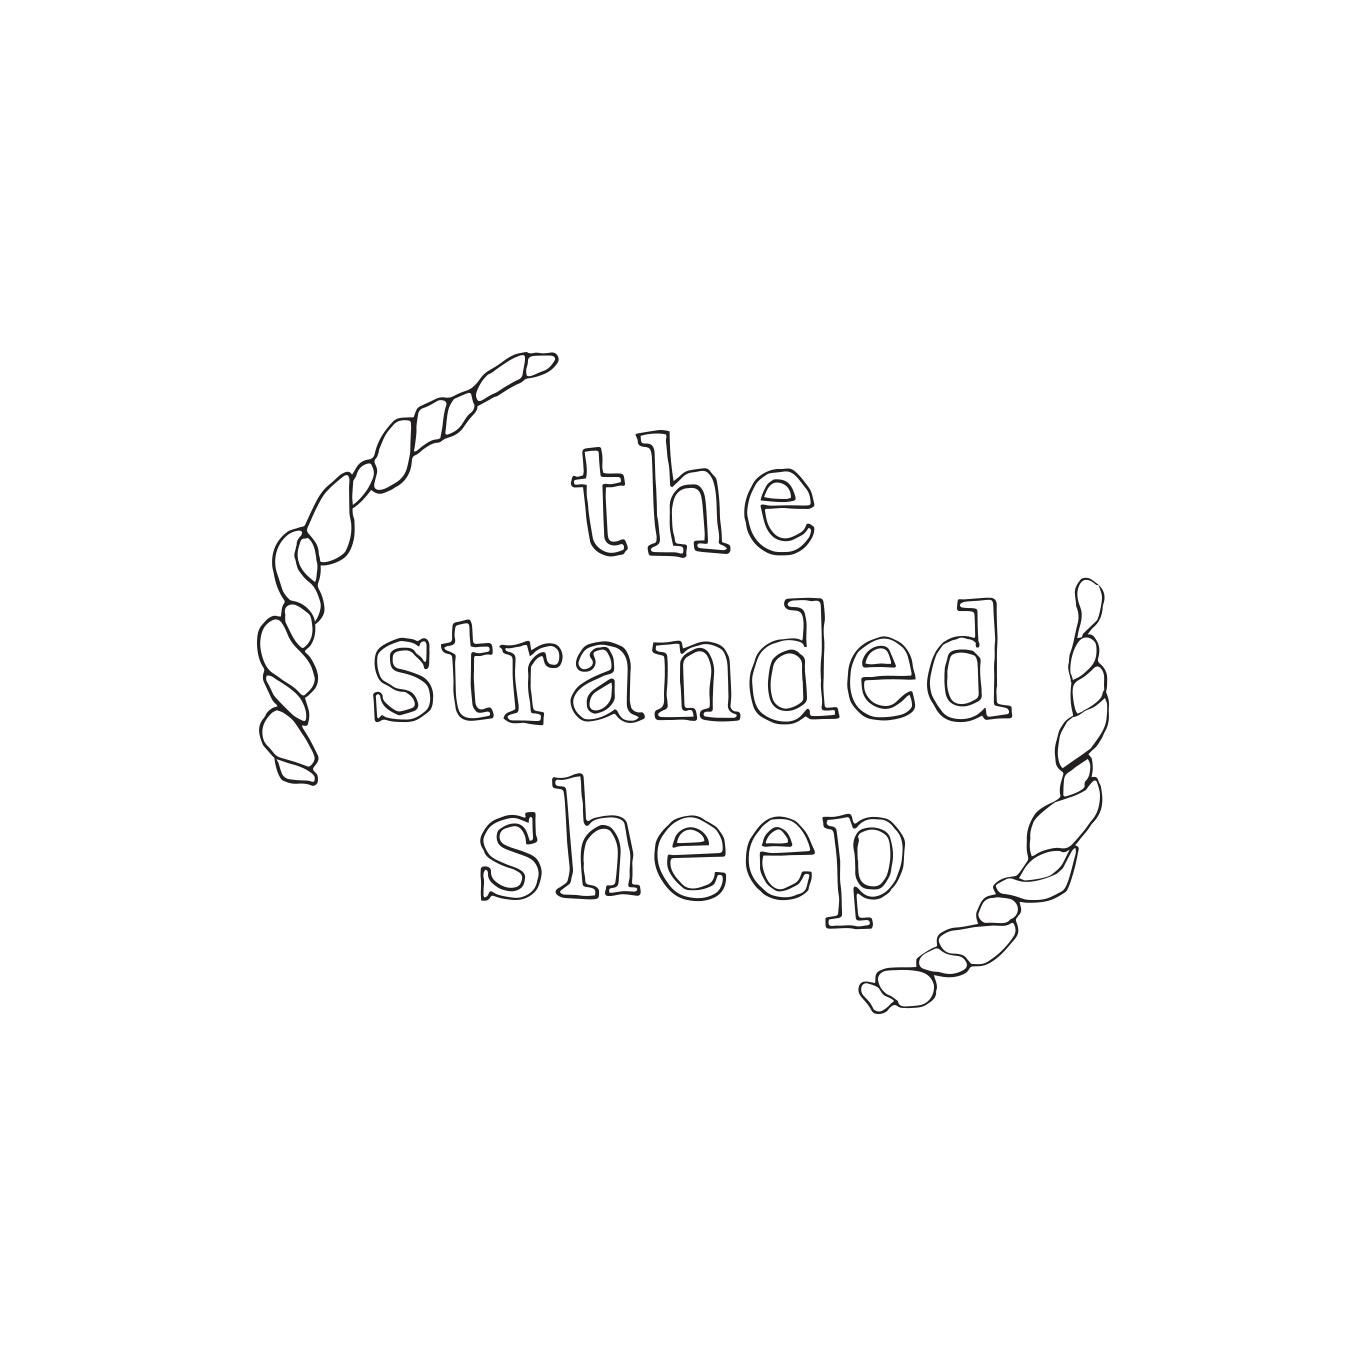 stranded-sheep-case-study-logo-3.jpg